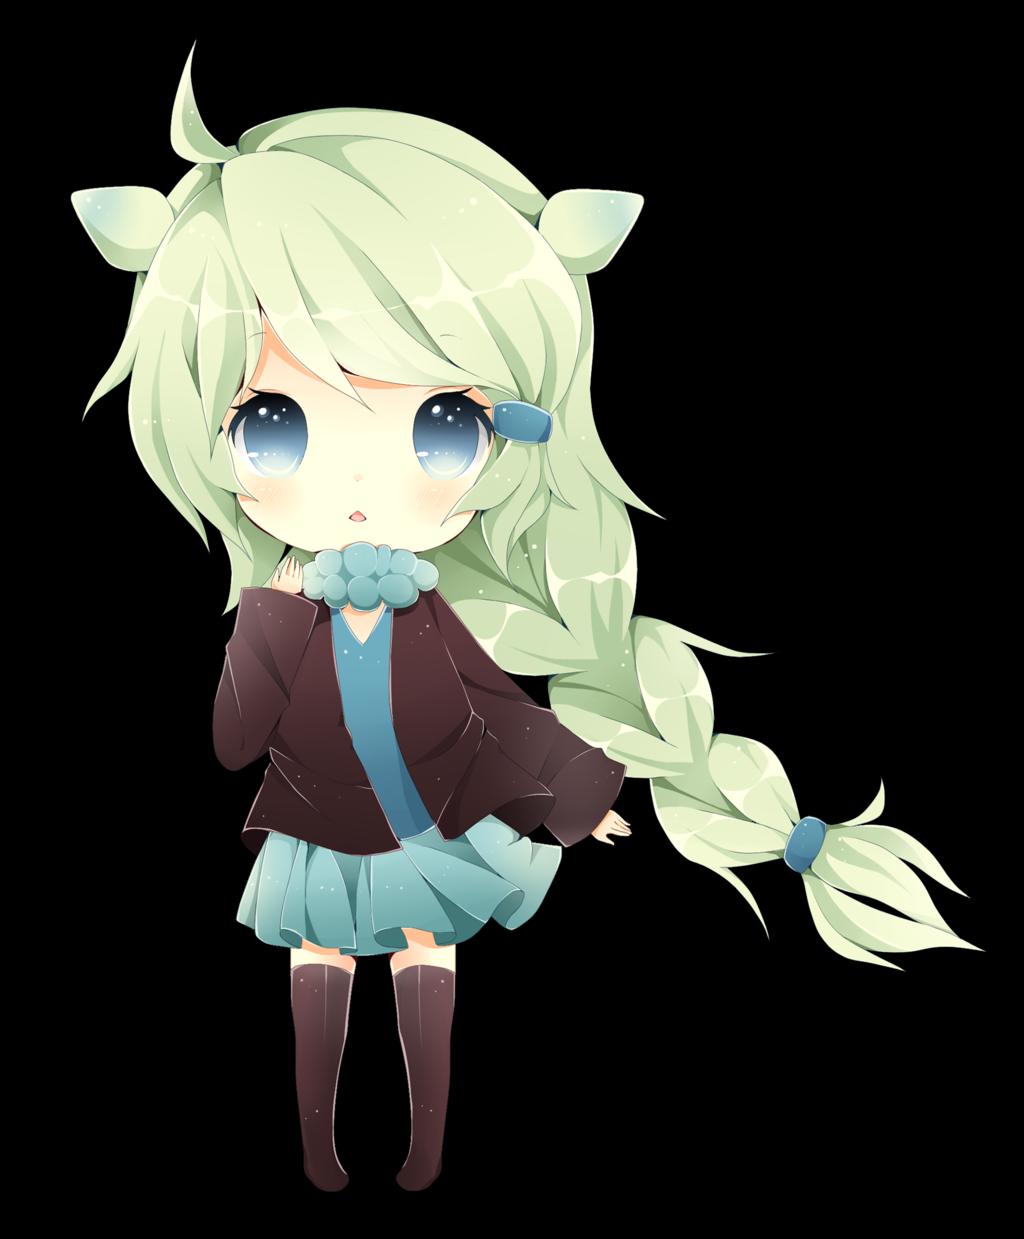 Pin by Emily Cueva on Anime Chibi, Kawaii chibi, Anime